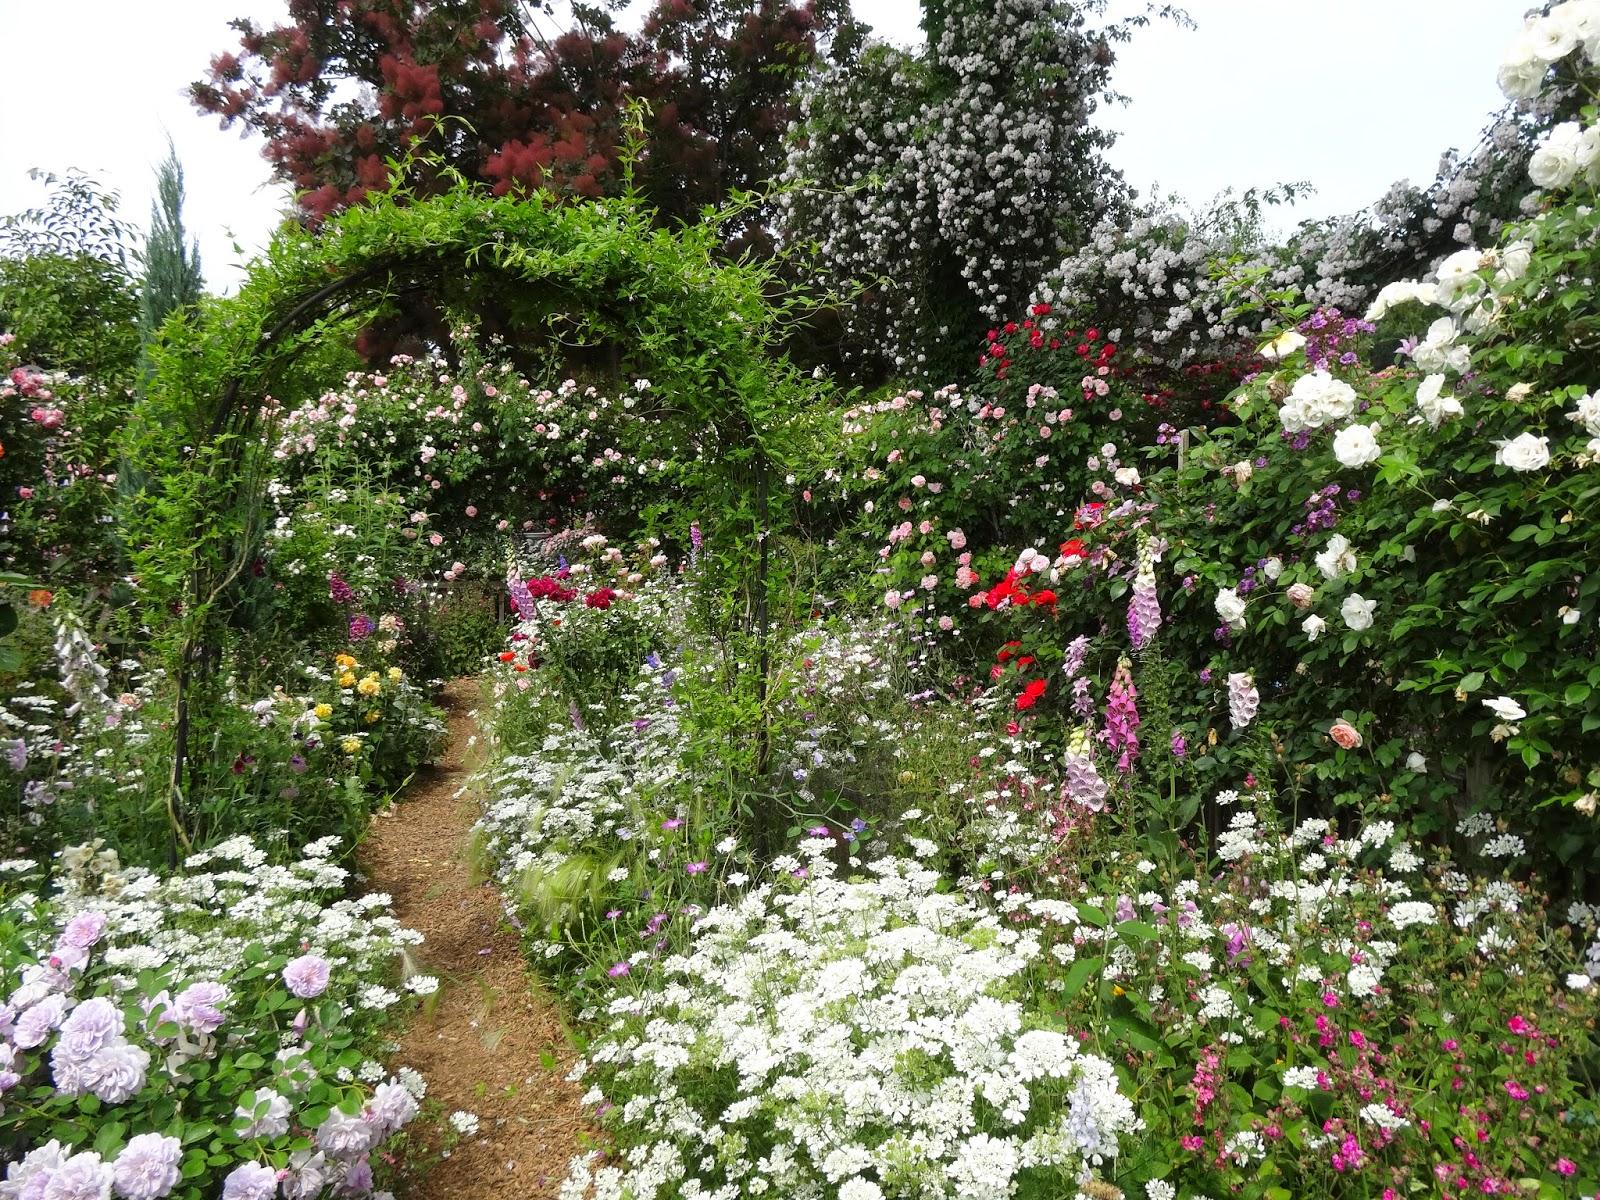 Le jardin secret 2015 for Jardin secret 2015